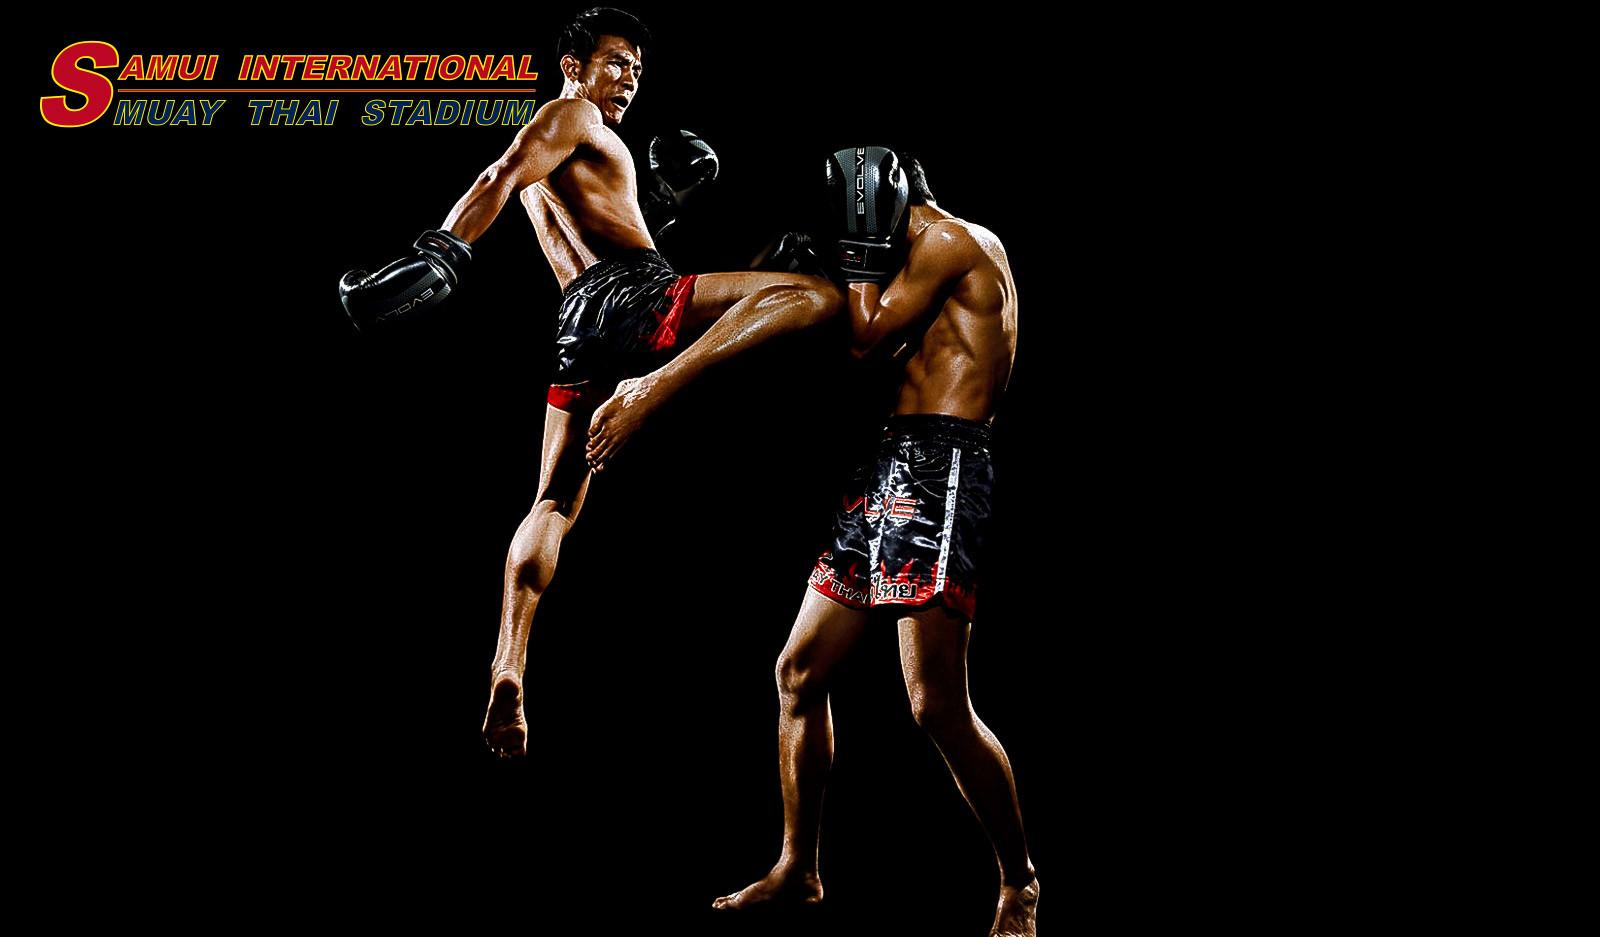 flying-kick-samui-international-muay-tha